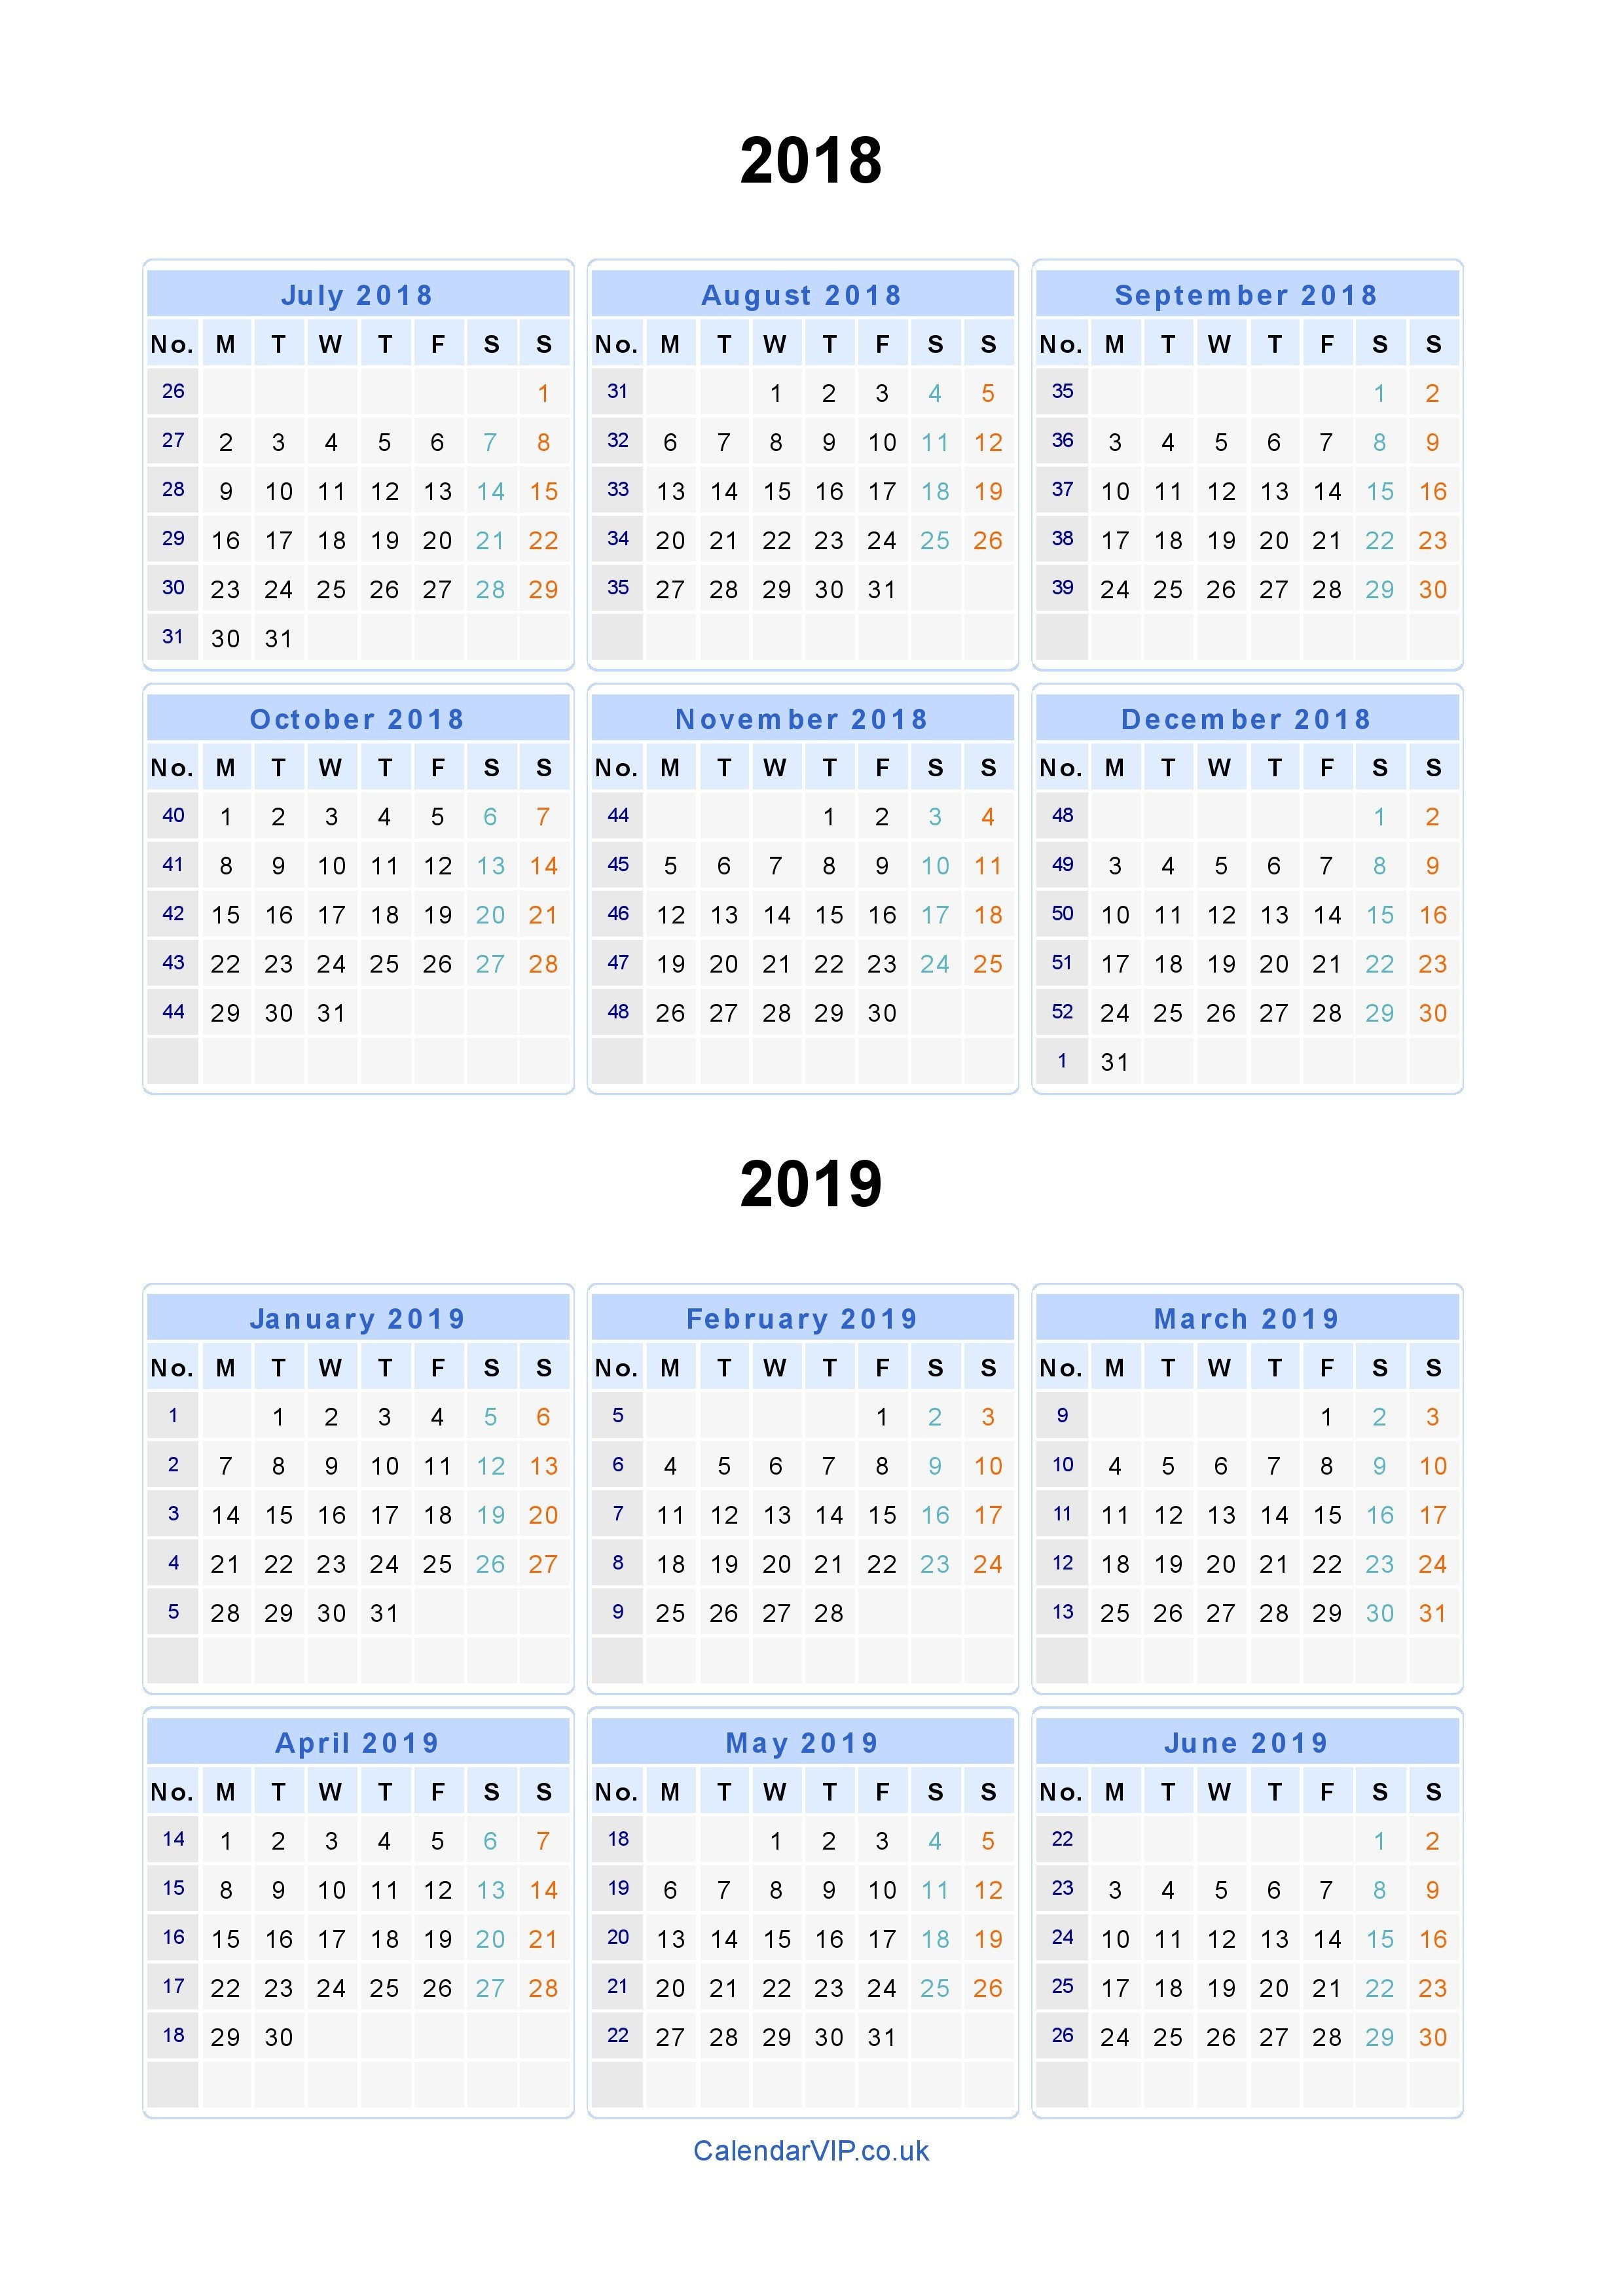 Split Year Calendars 2018 2019 – Calendar From July 2018 To June 2019 2019 Calendar 4 5 4